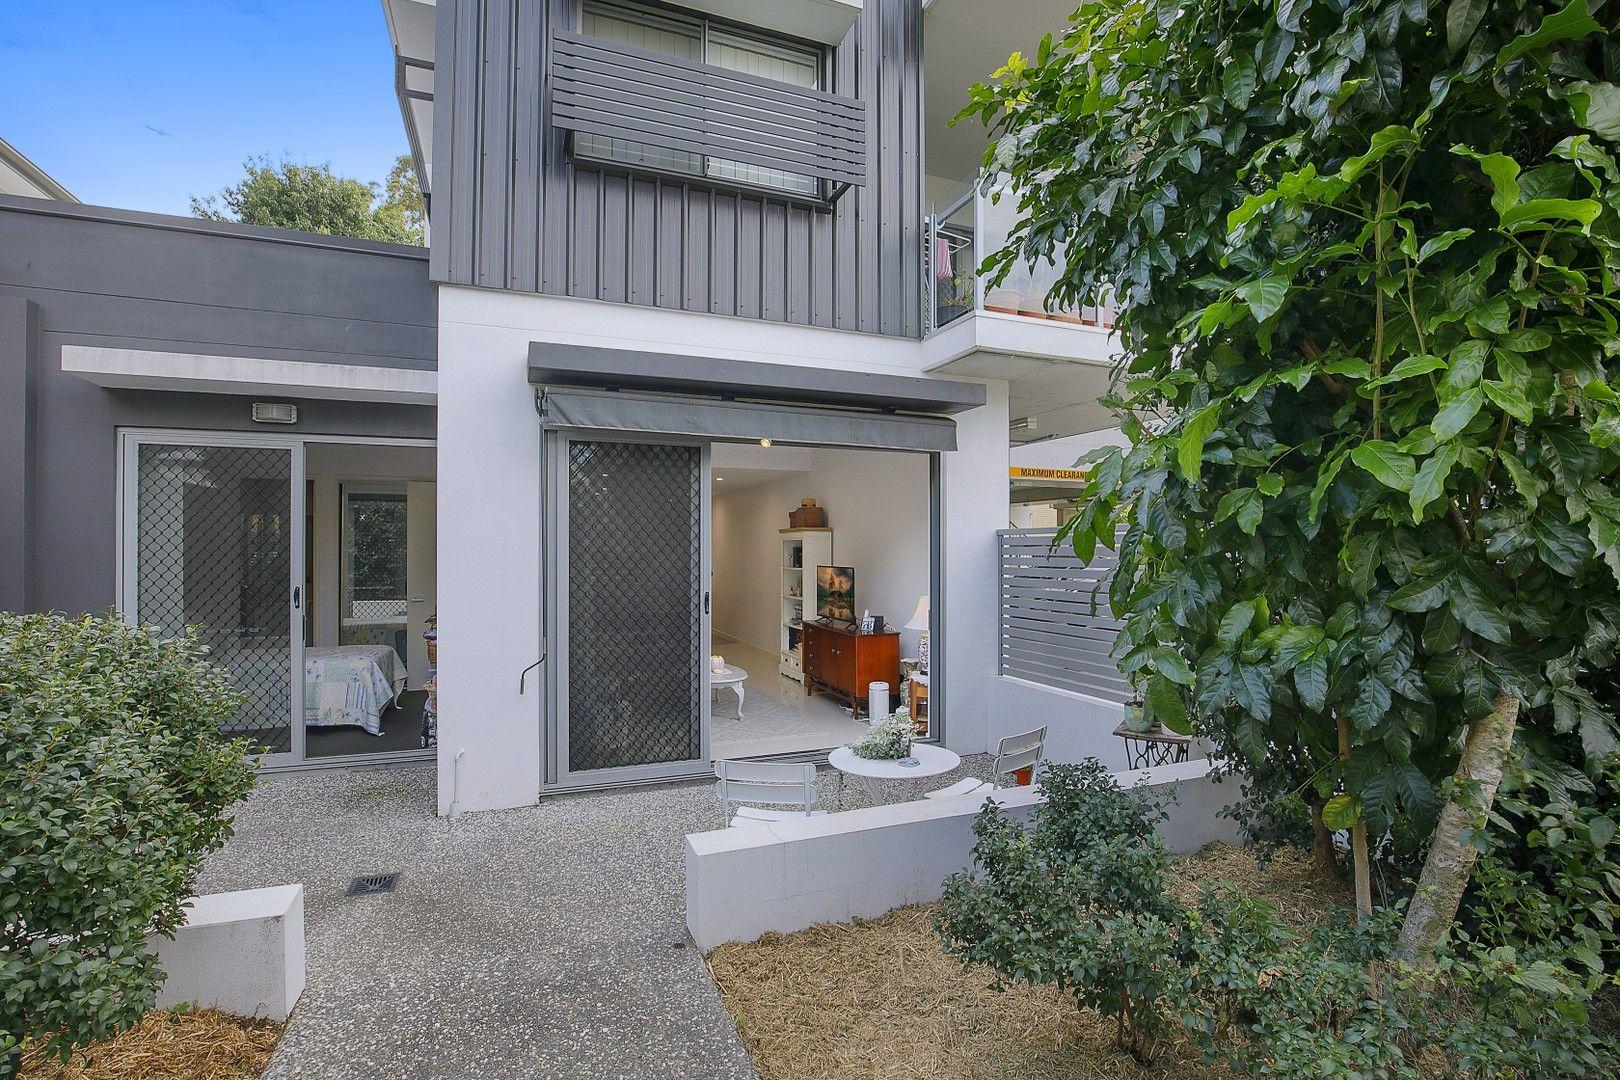 1/68 Kitchener Street, Coorparoo QLD 4151, Image 1